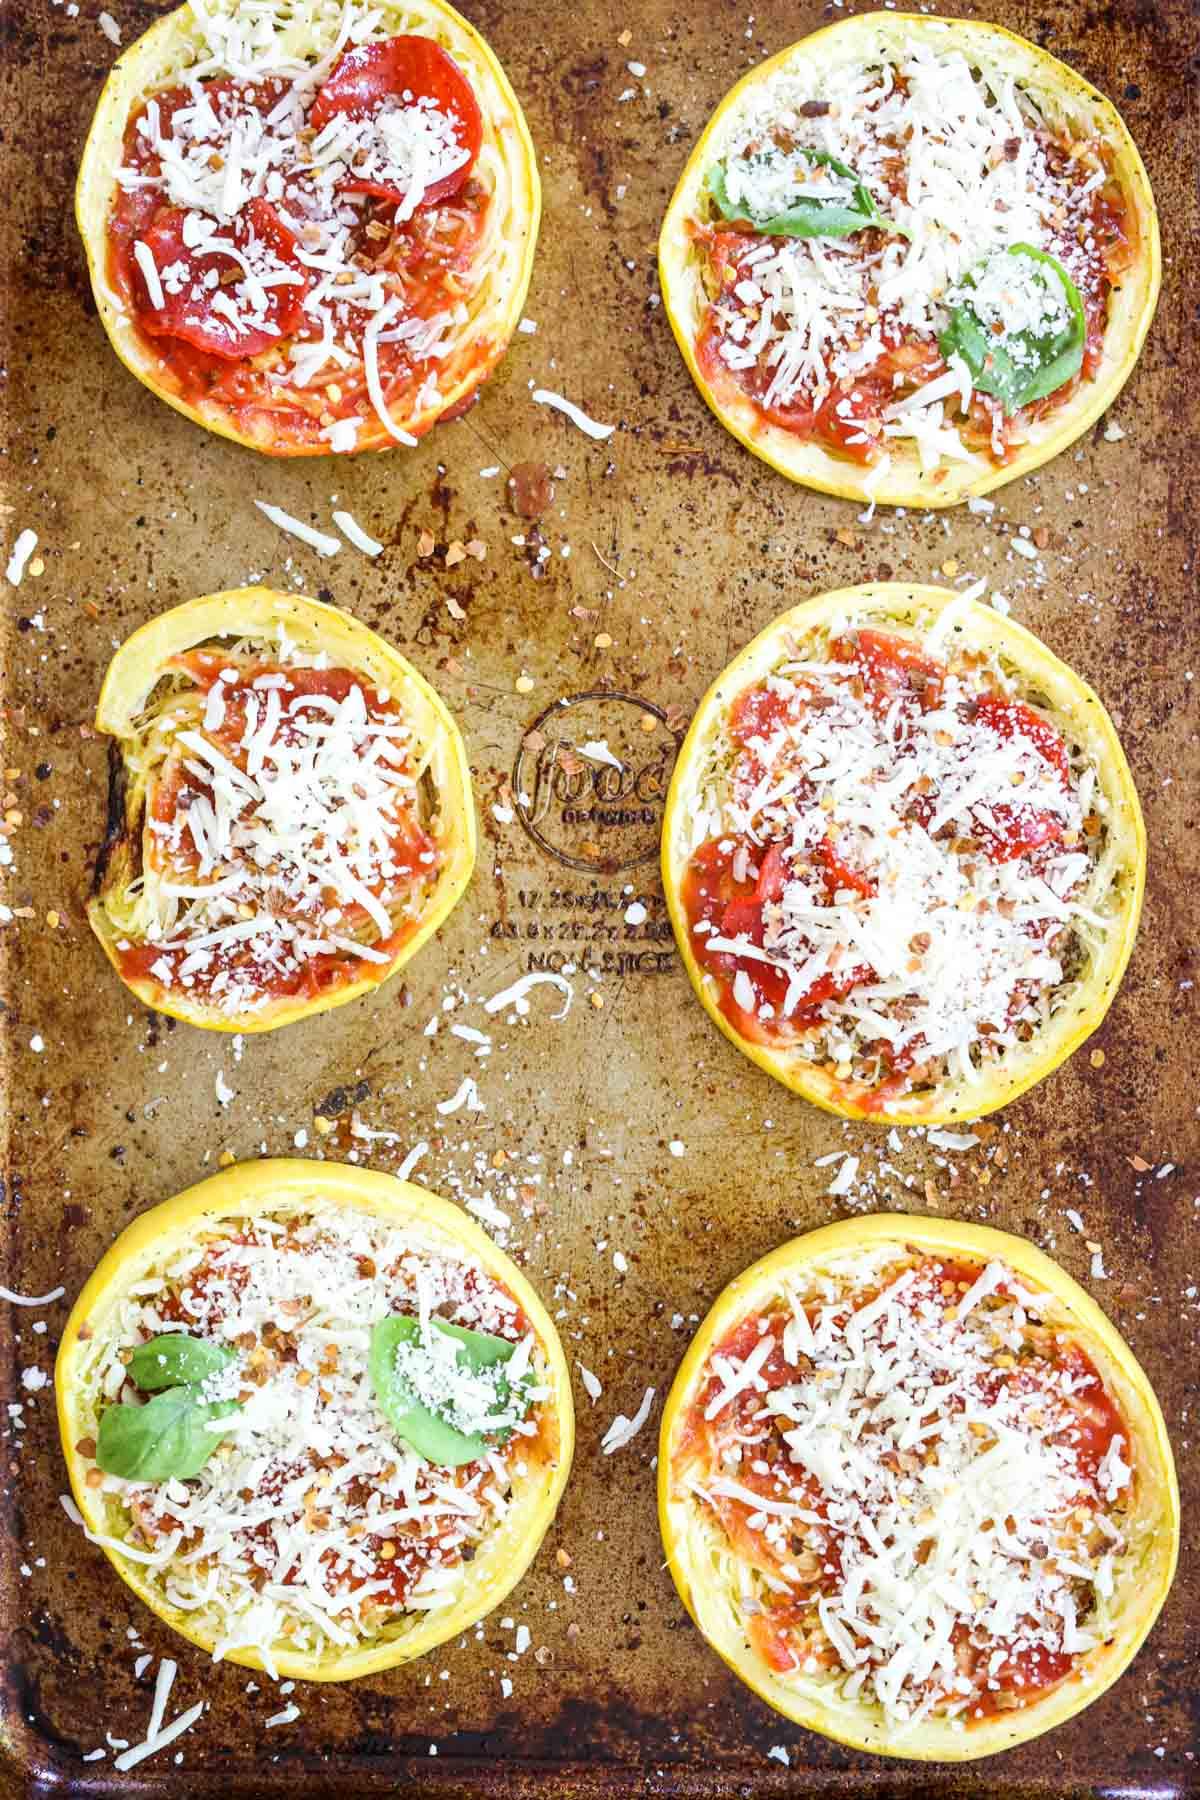 adding toppings to spaghetti squash pizza